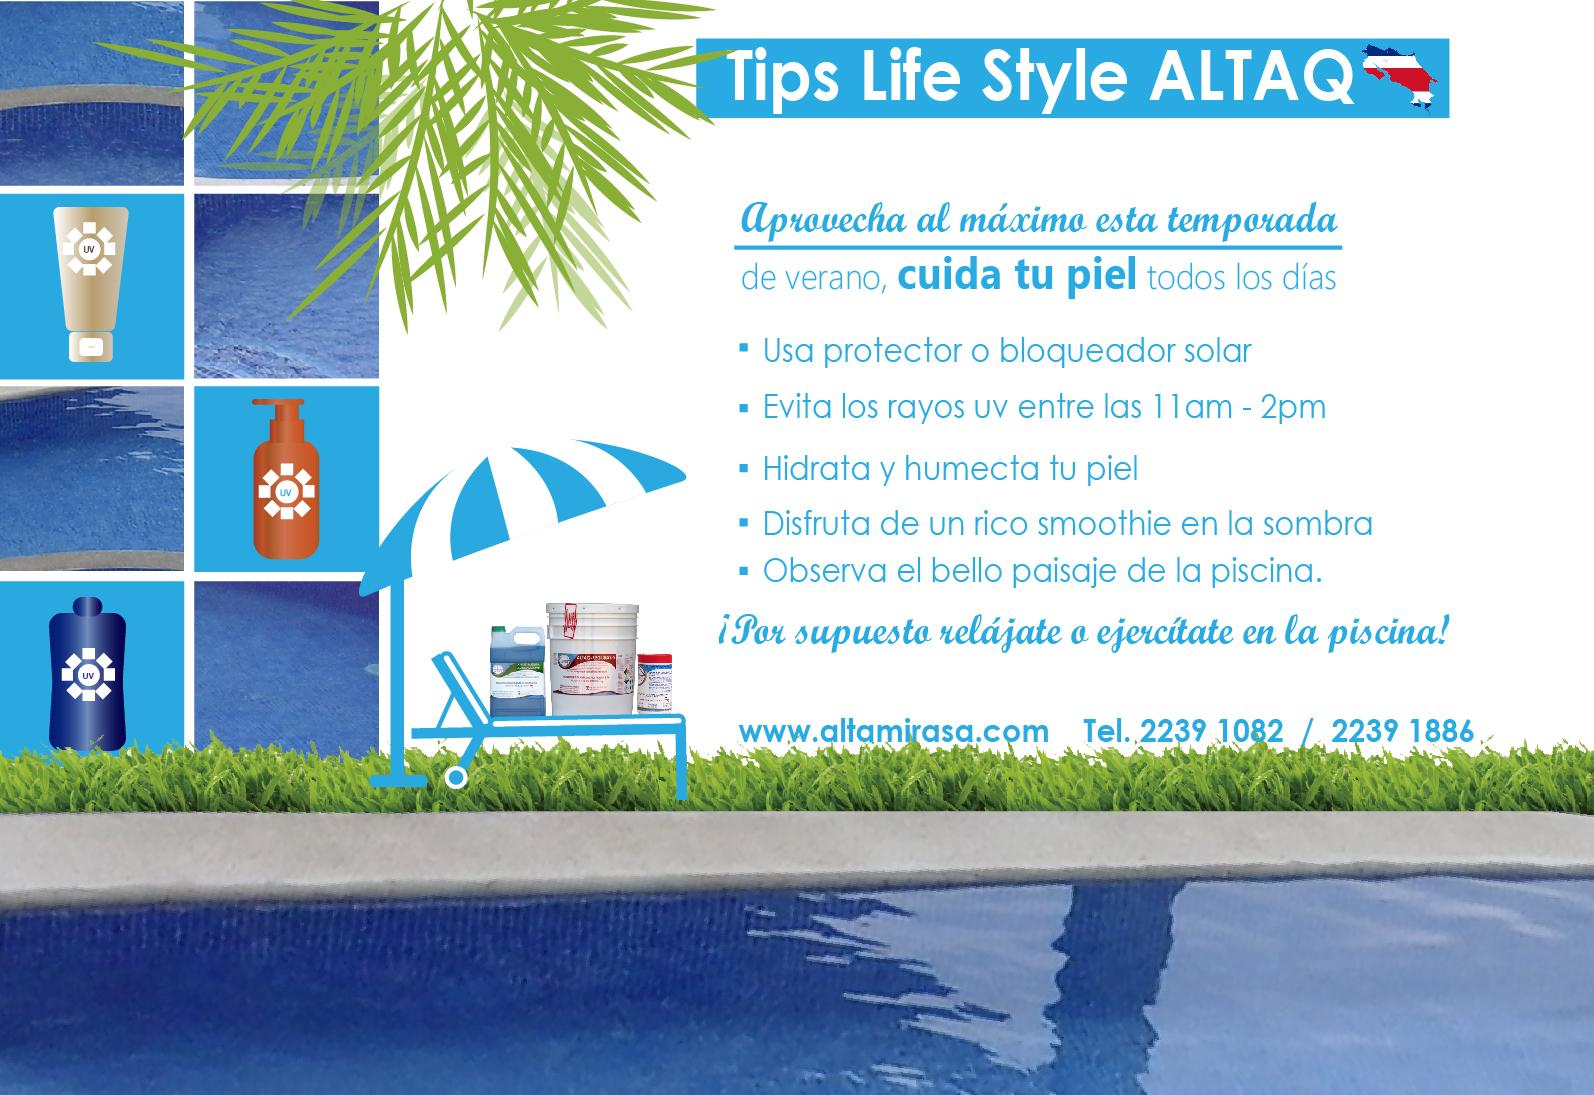 Tips life style ALTAQ para el verano